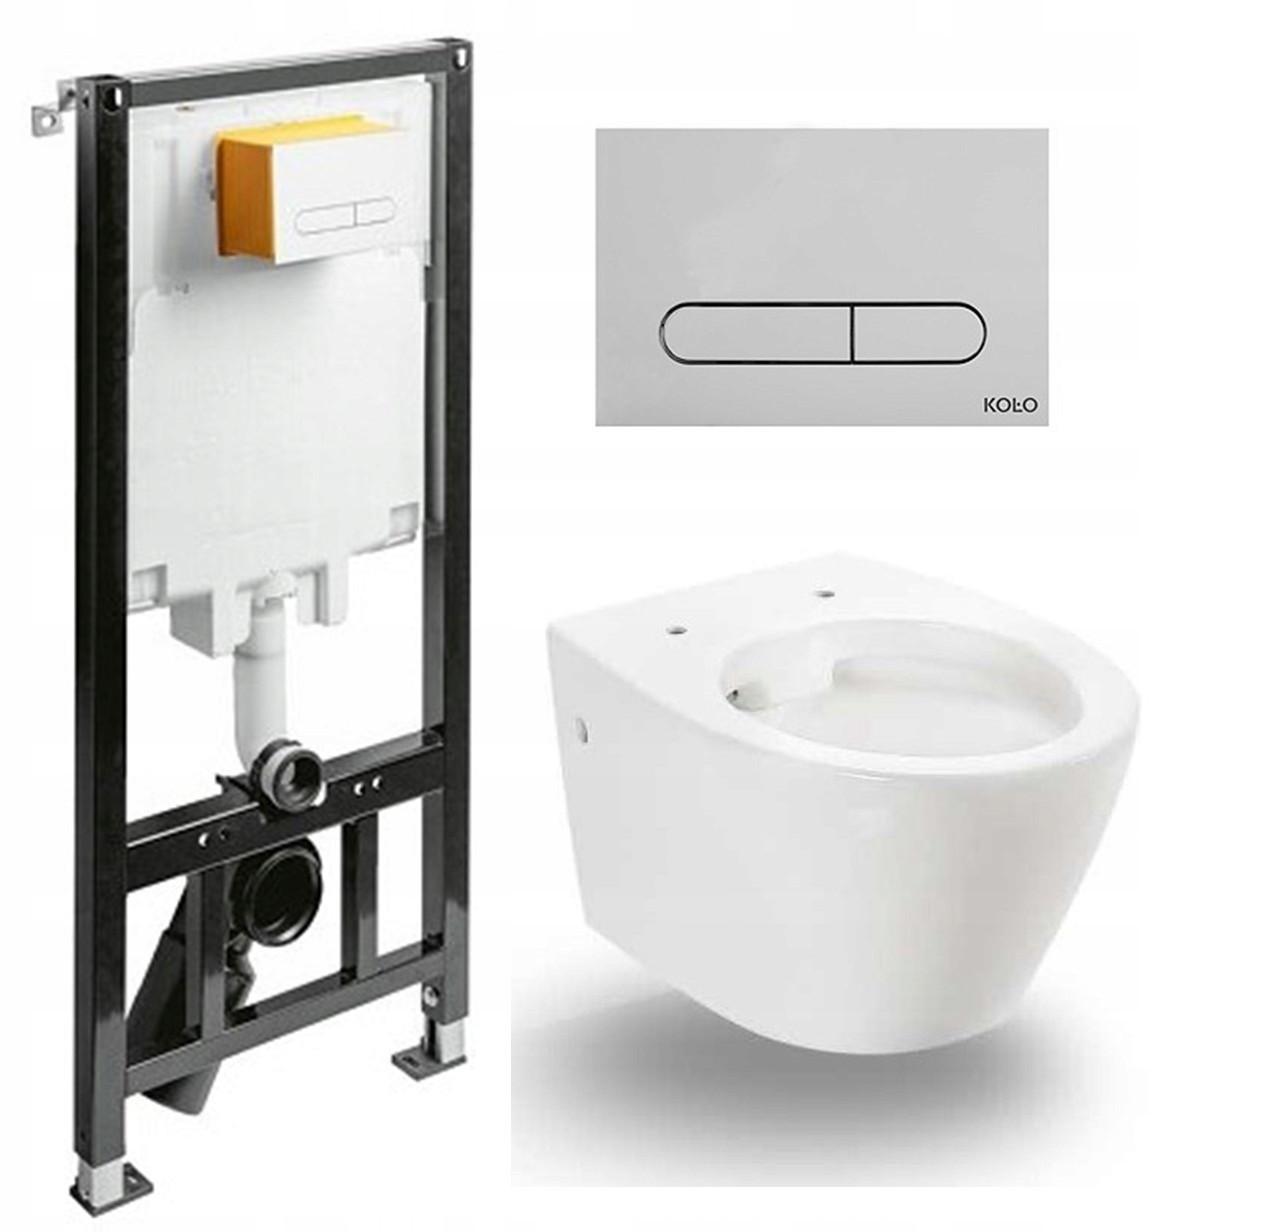 Туалетный каркас KOLO SLIM 2 + Раковина T038 + Кнопка